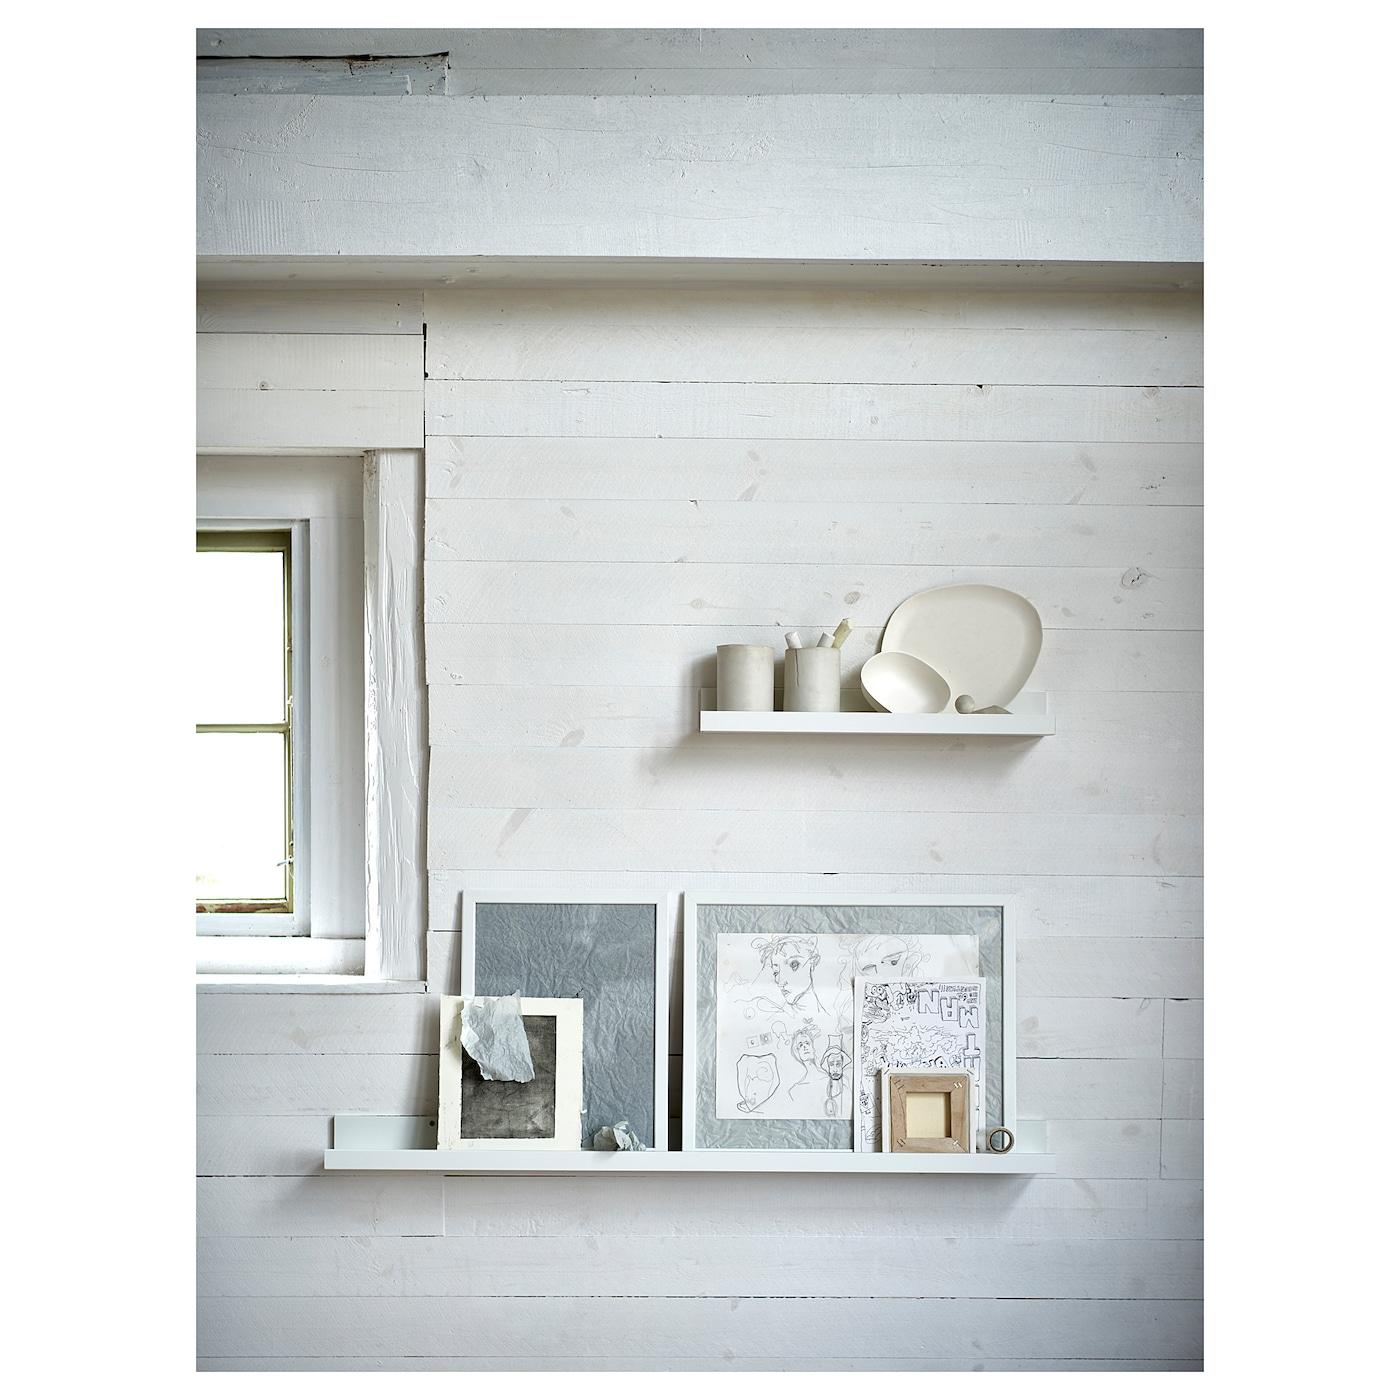 55cm /& 115cm Set IKEA MOSSLANDA Picture Photo Ledge Rail Shelf Black /& White